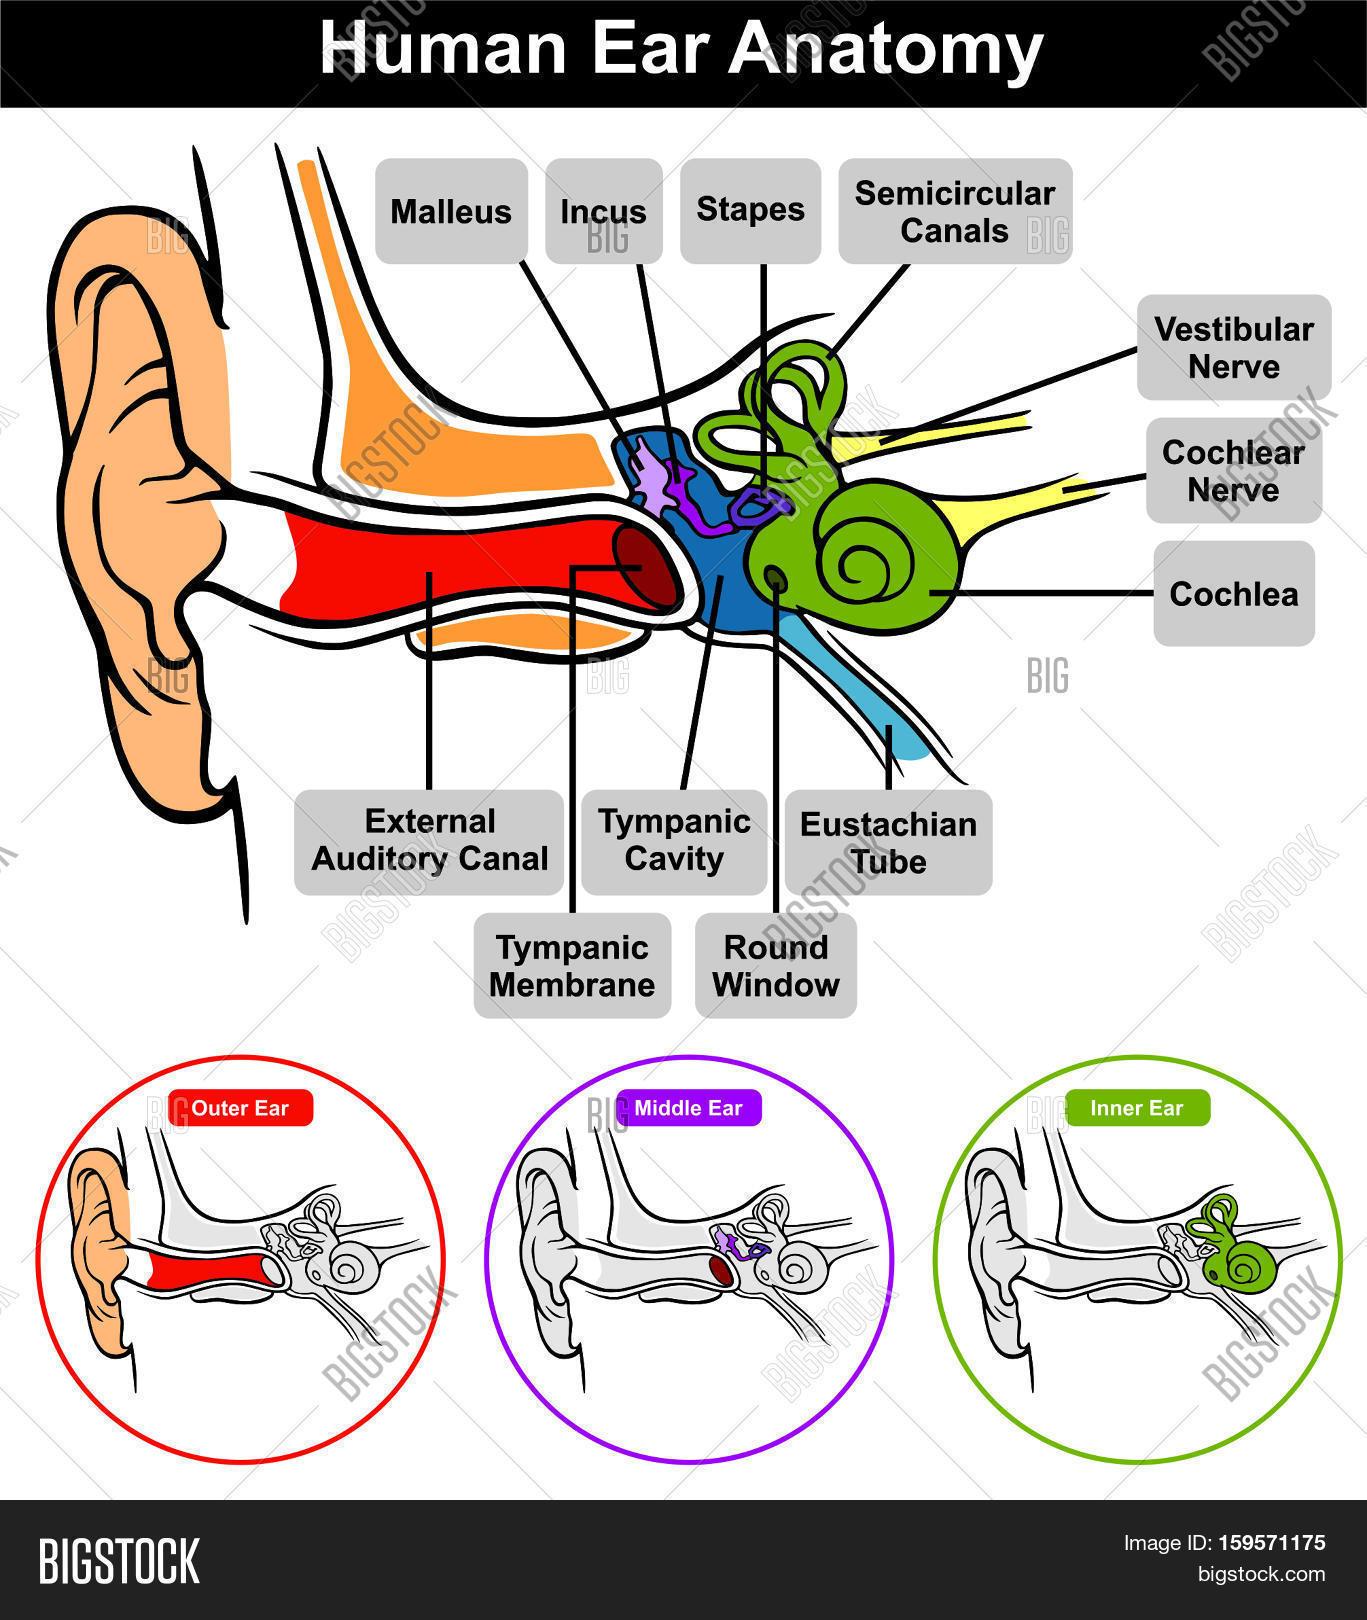 Human Ear Anatomy Image Amp Photo Free Trial